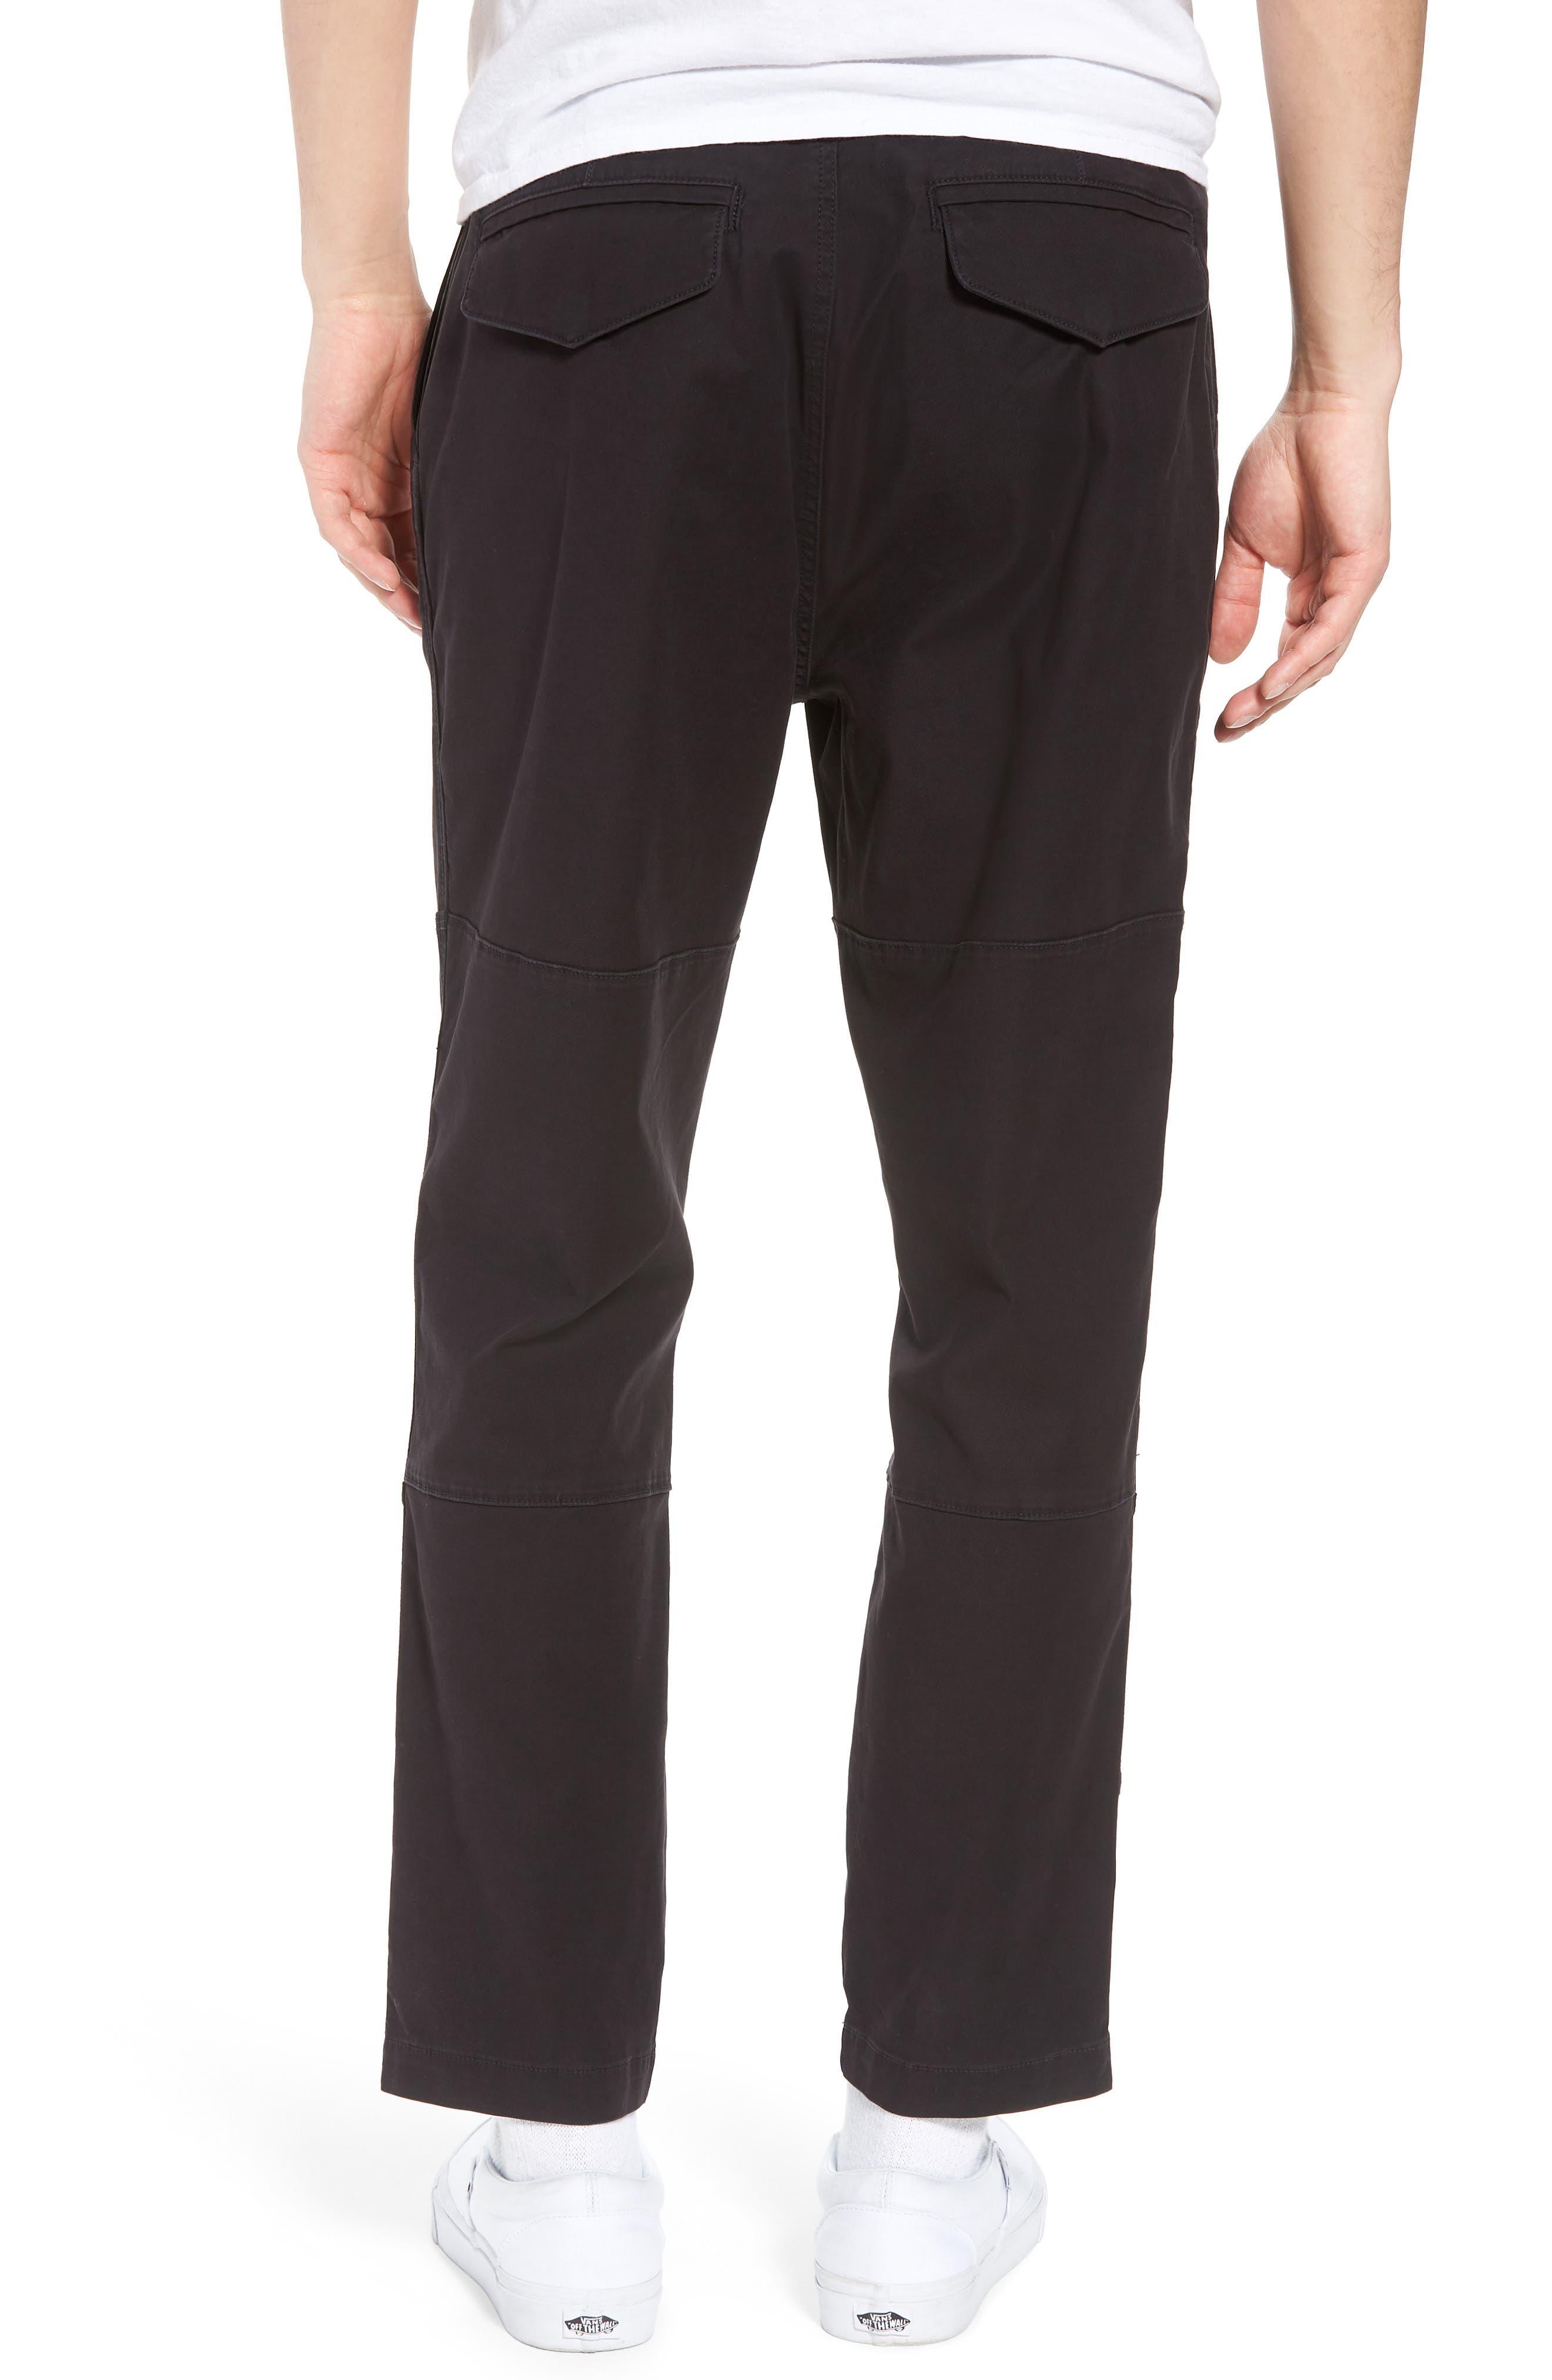 HUDSON JEANS,                             Slouchy Slim Fit Cargo Pants,                             Alternate thumbnail 2, color,                             001